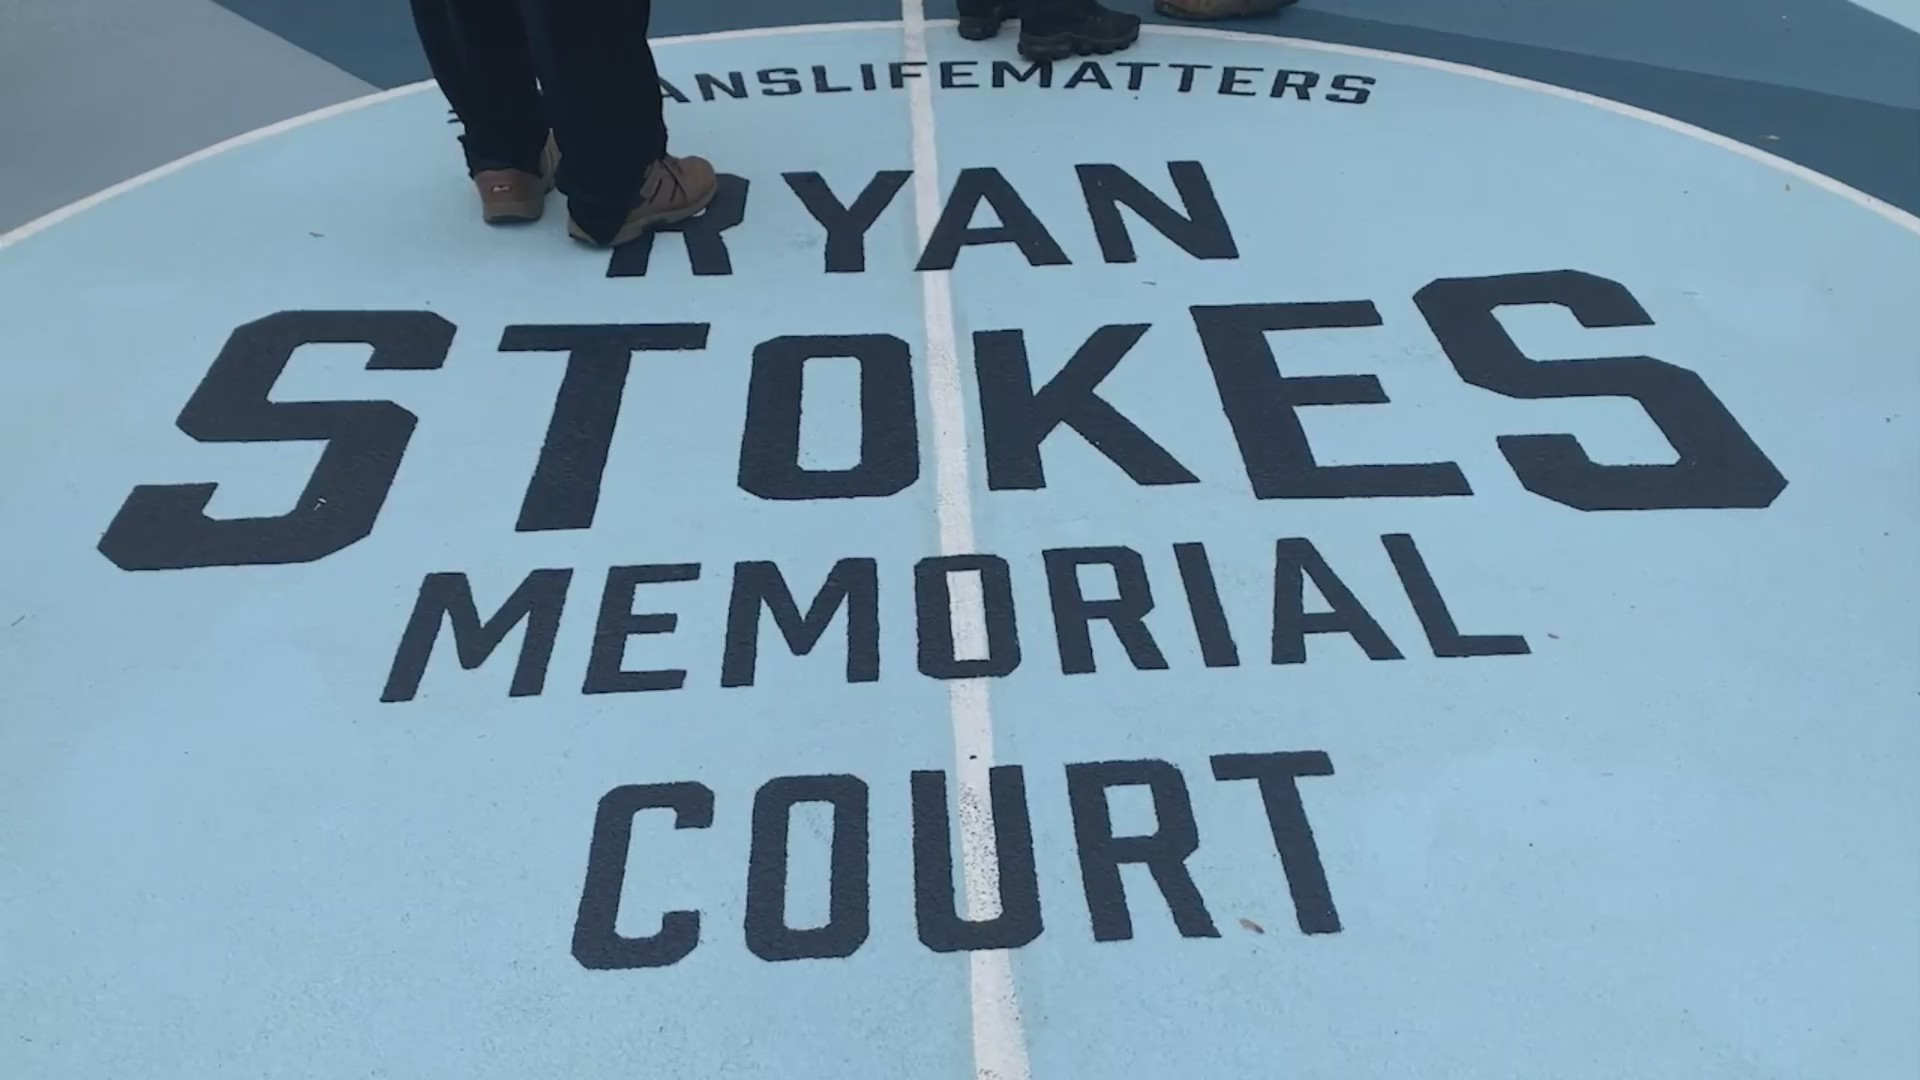 Ryan Stokes Memorial Court